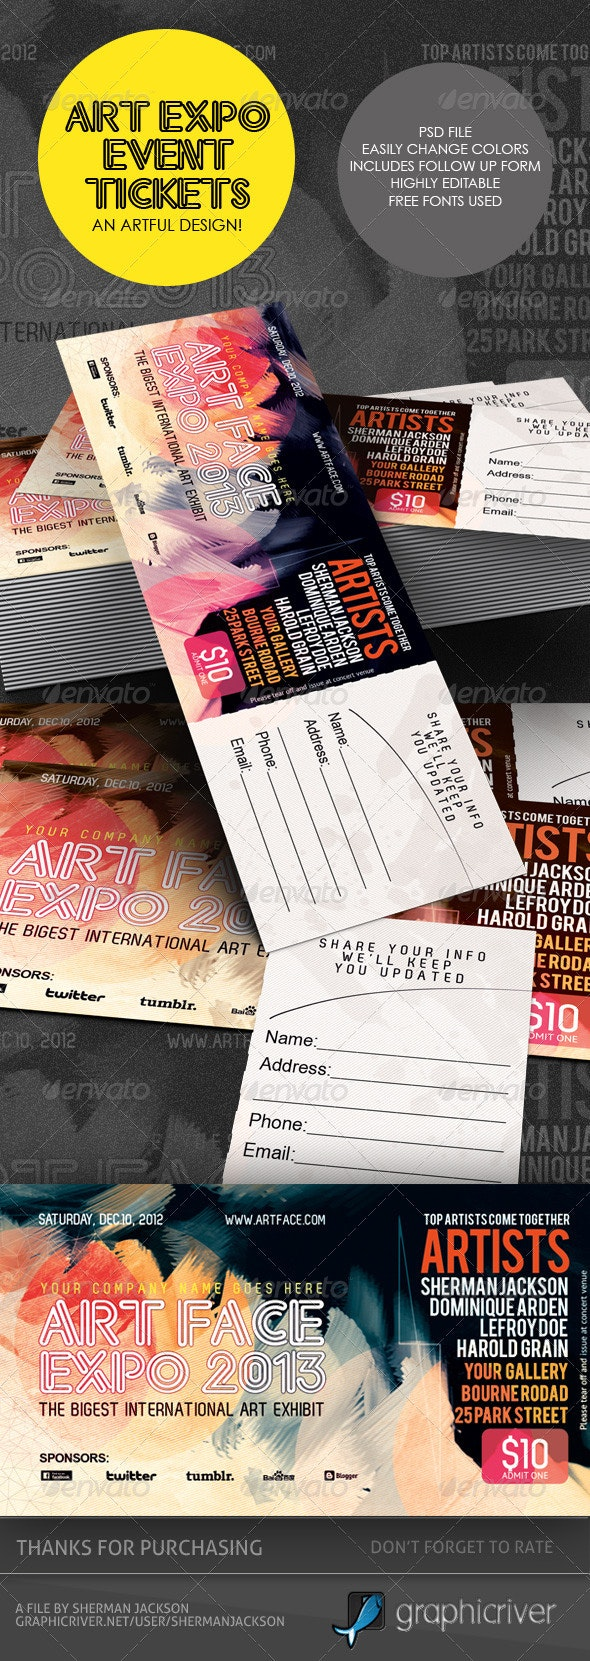 Art Expo Art Show Event Tickets & Passes Template - Miscellaneous Print Templates